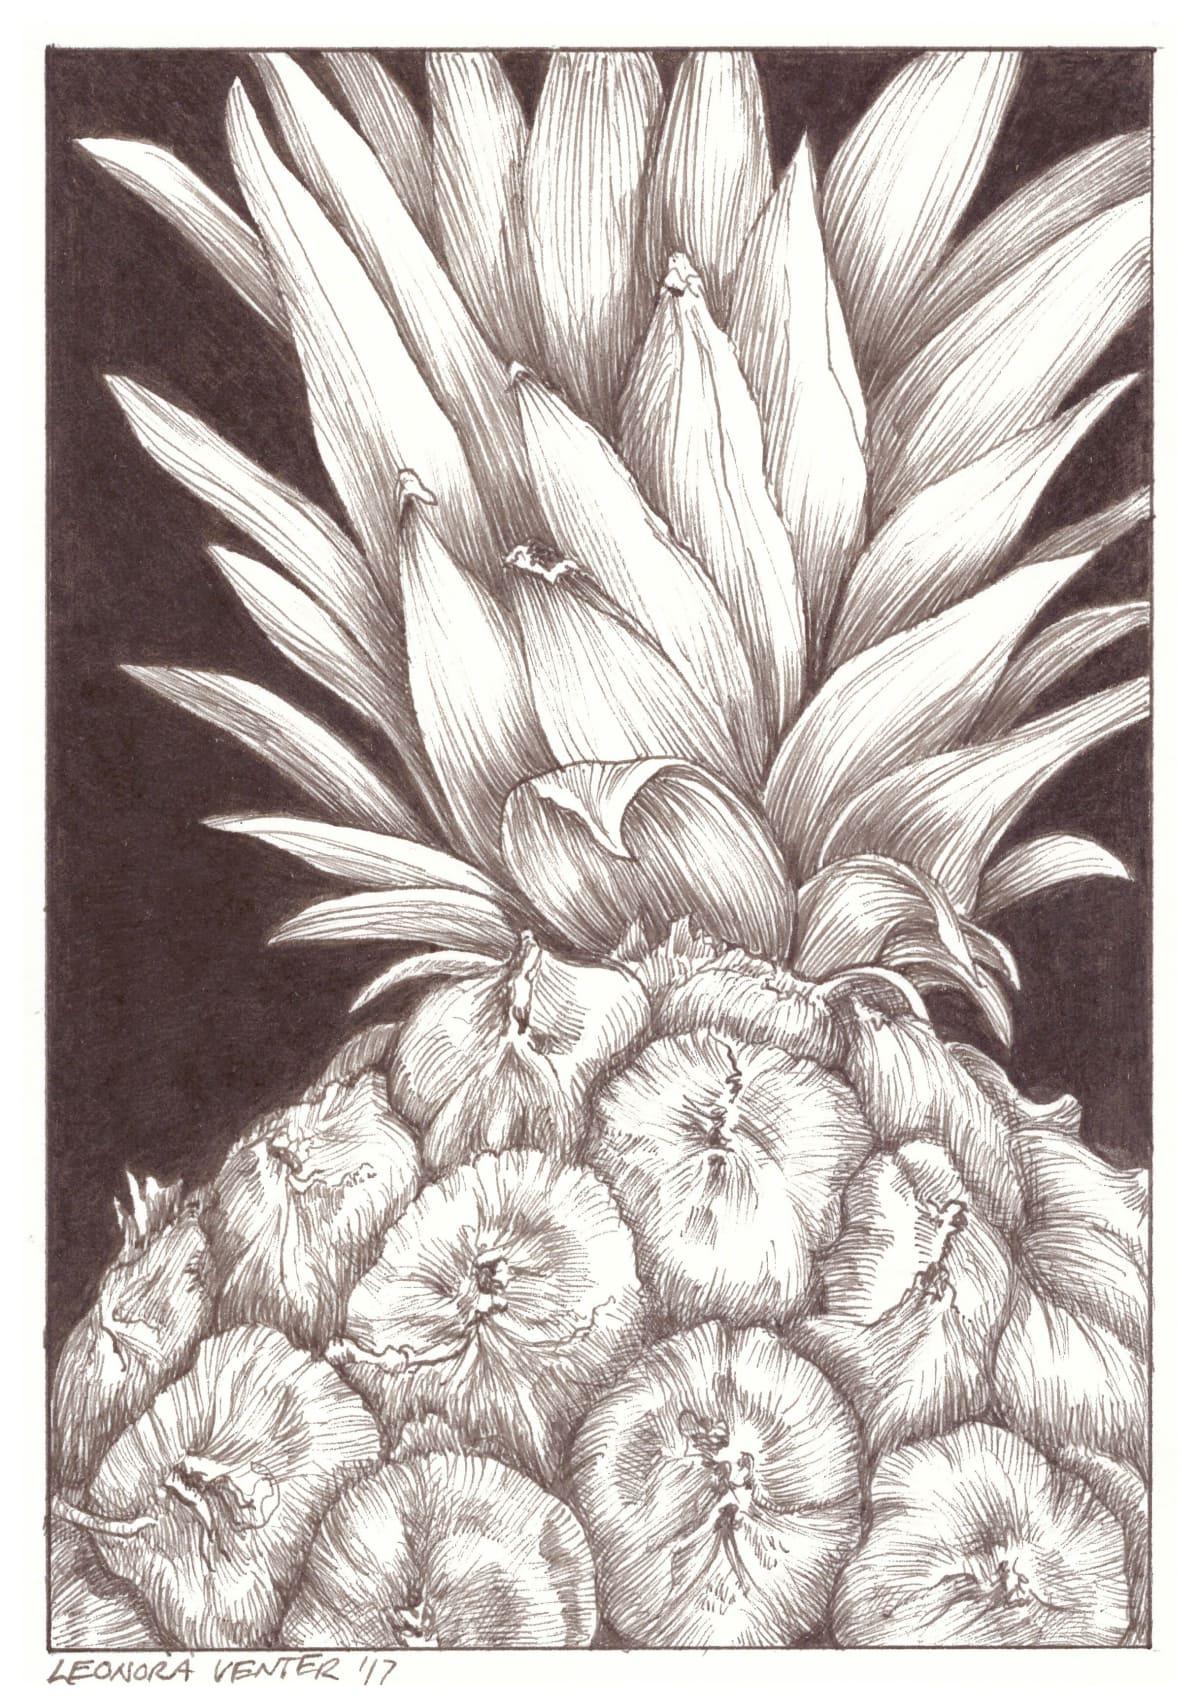 Leonora Venter, Pineapple, 2017